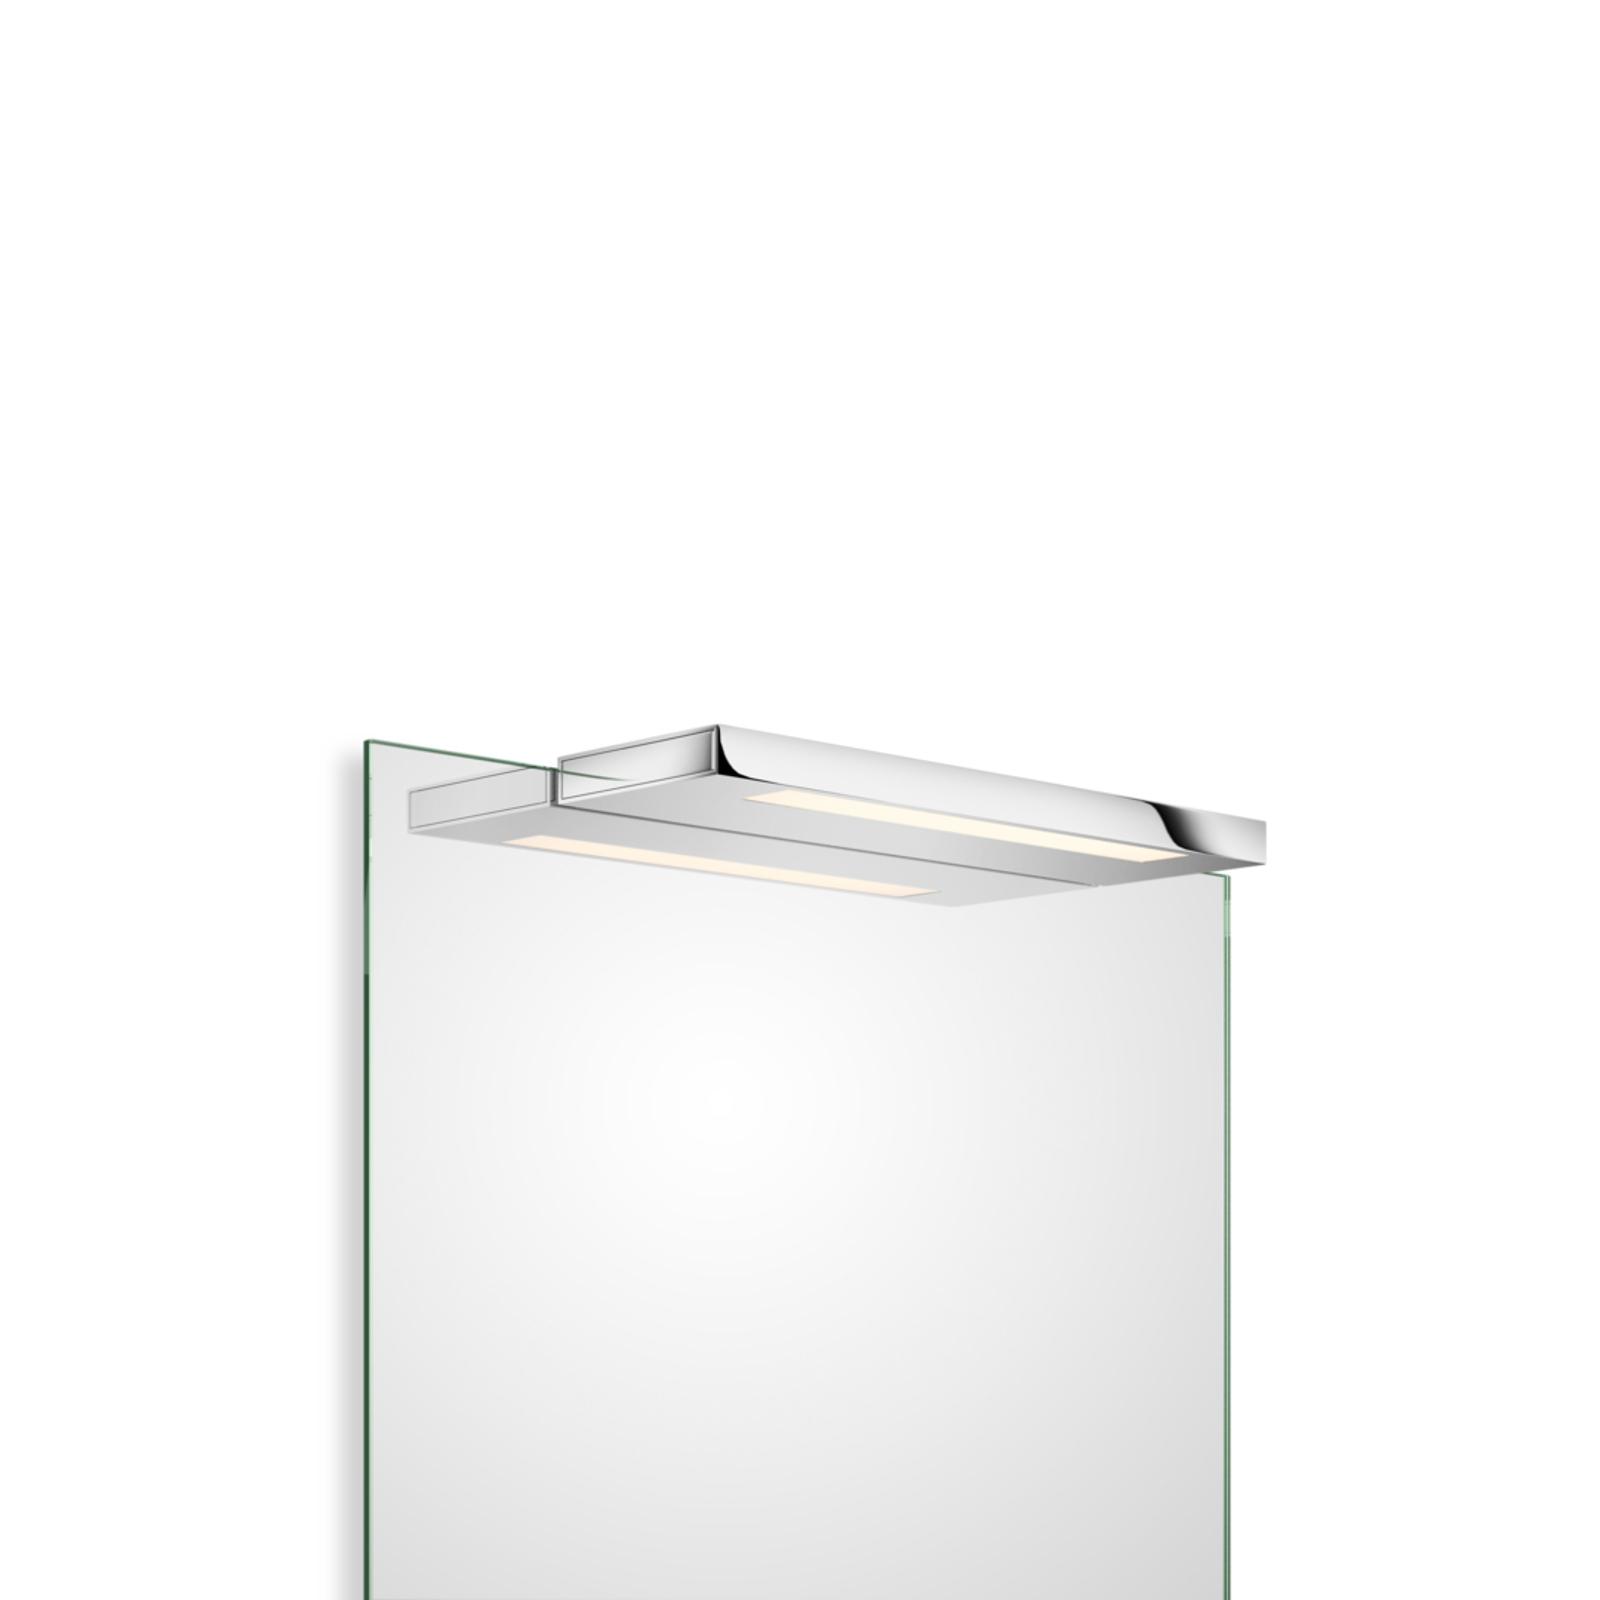 Decor Walther Slim LED-spegellampa krom 34 cm